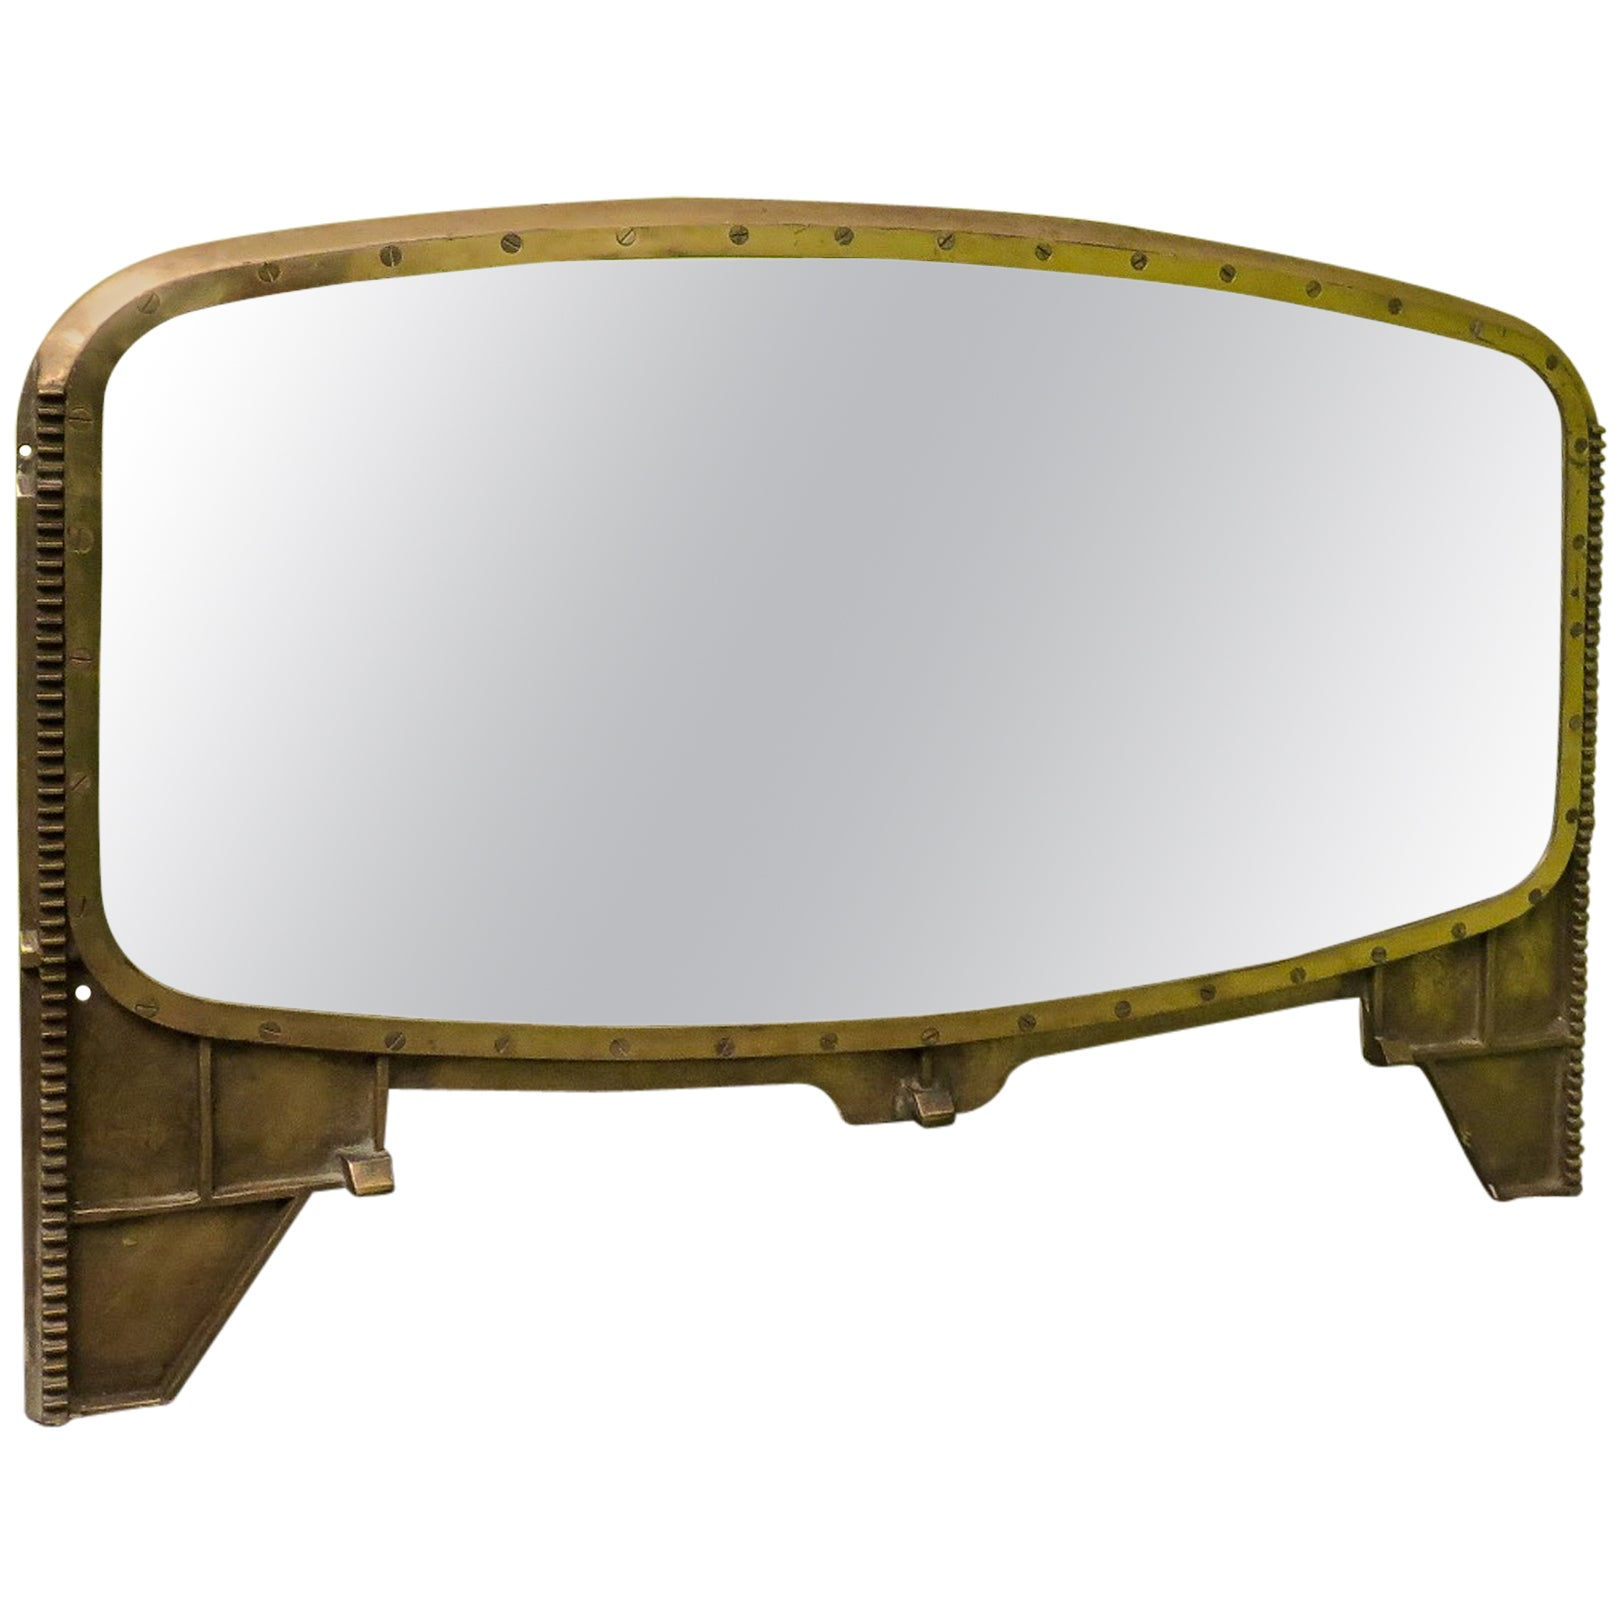 Art Deco Oval Brass Italian Mirror, 1930